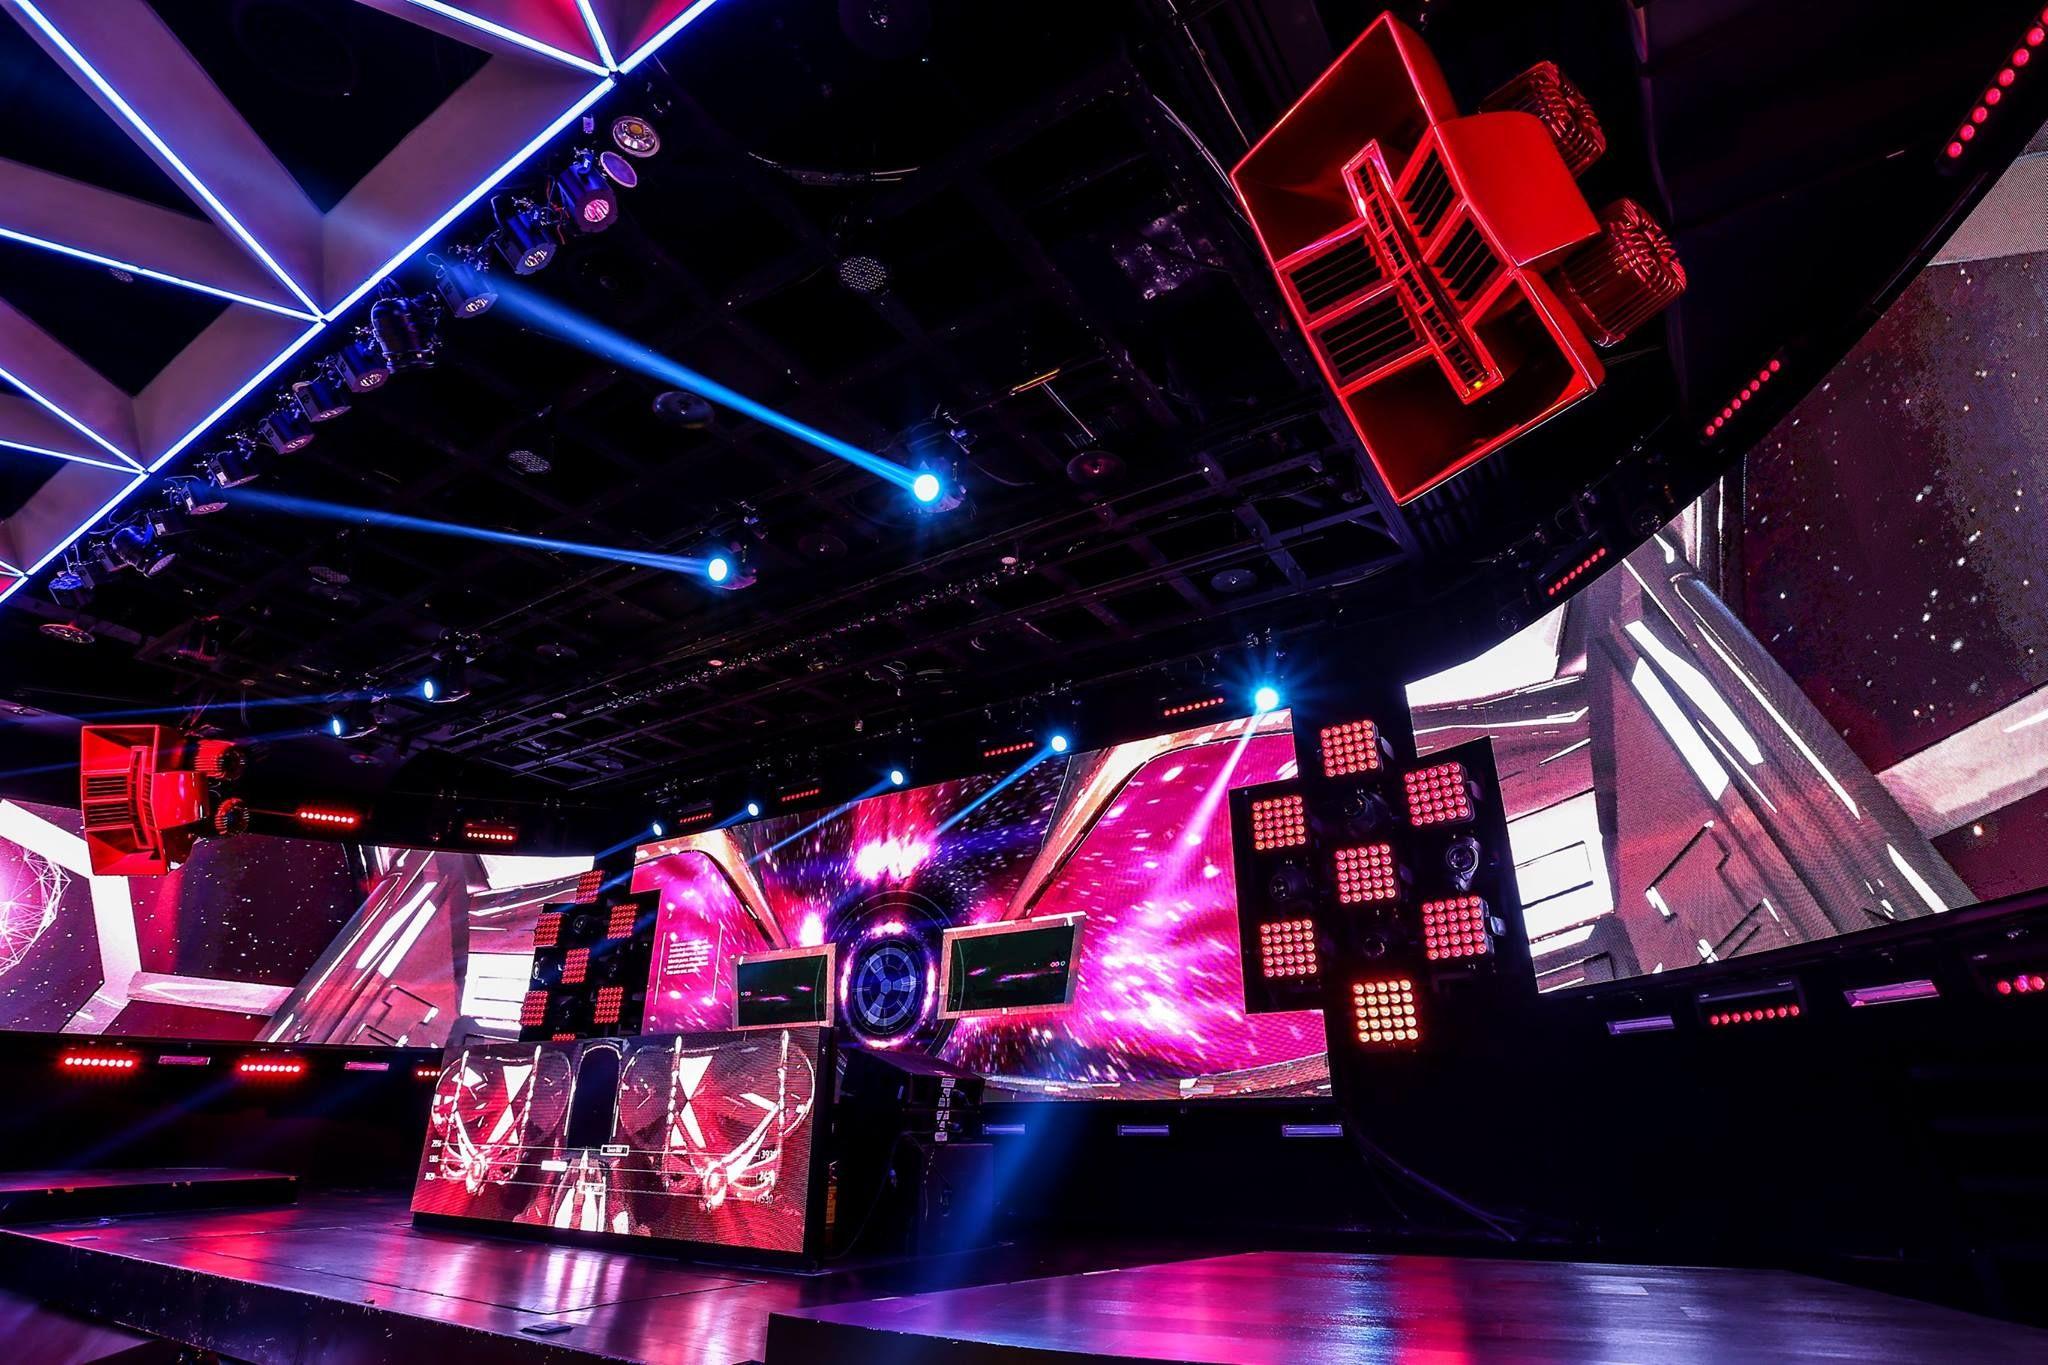 Omni, Taipei | Dance club, Sound system, Installation